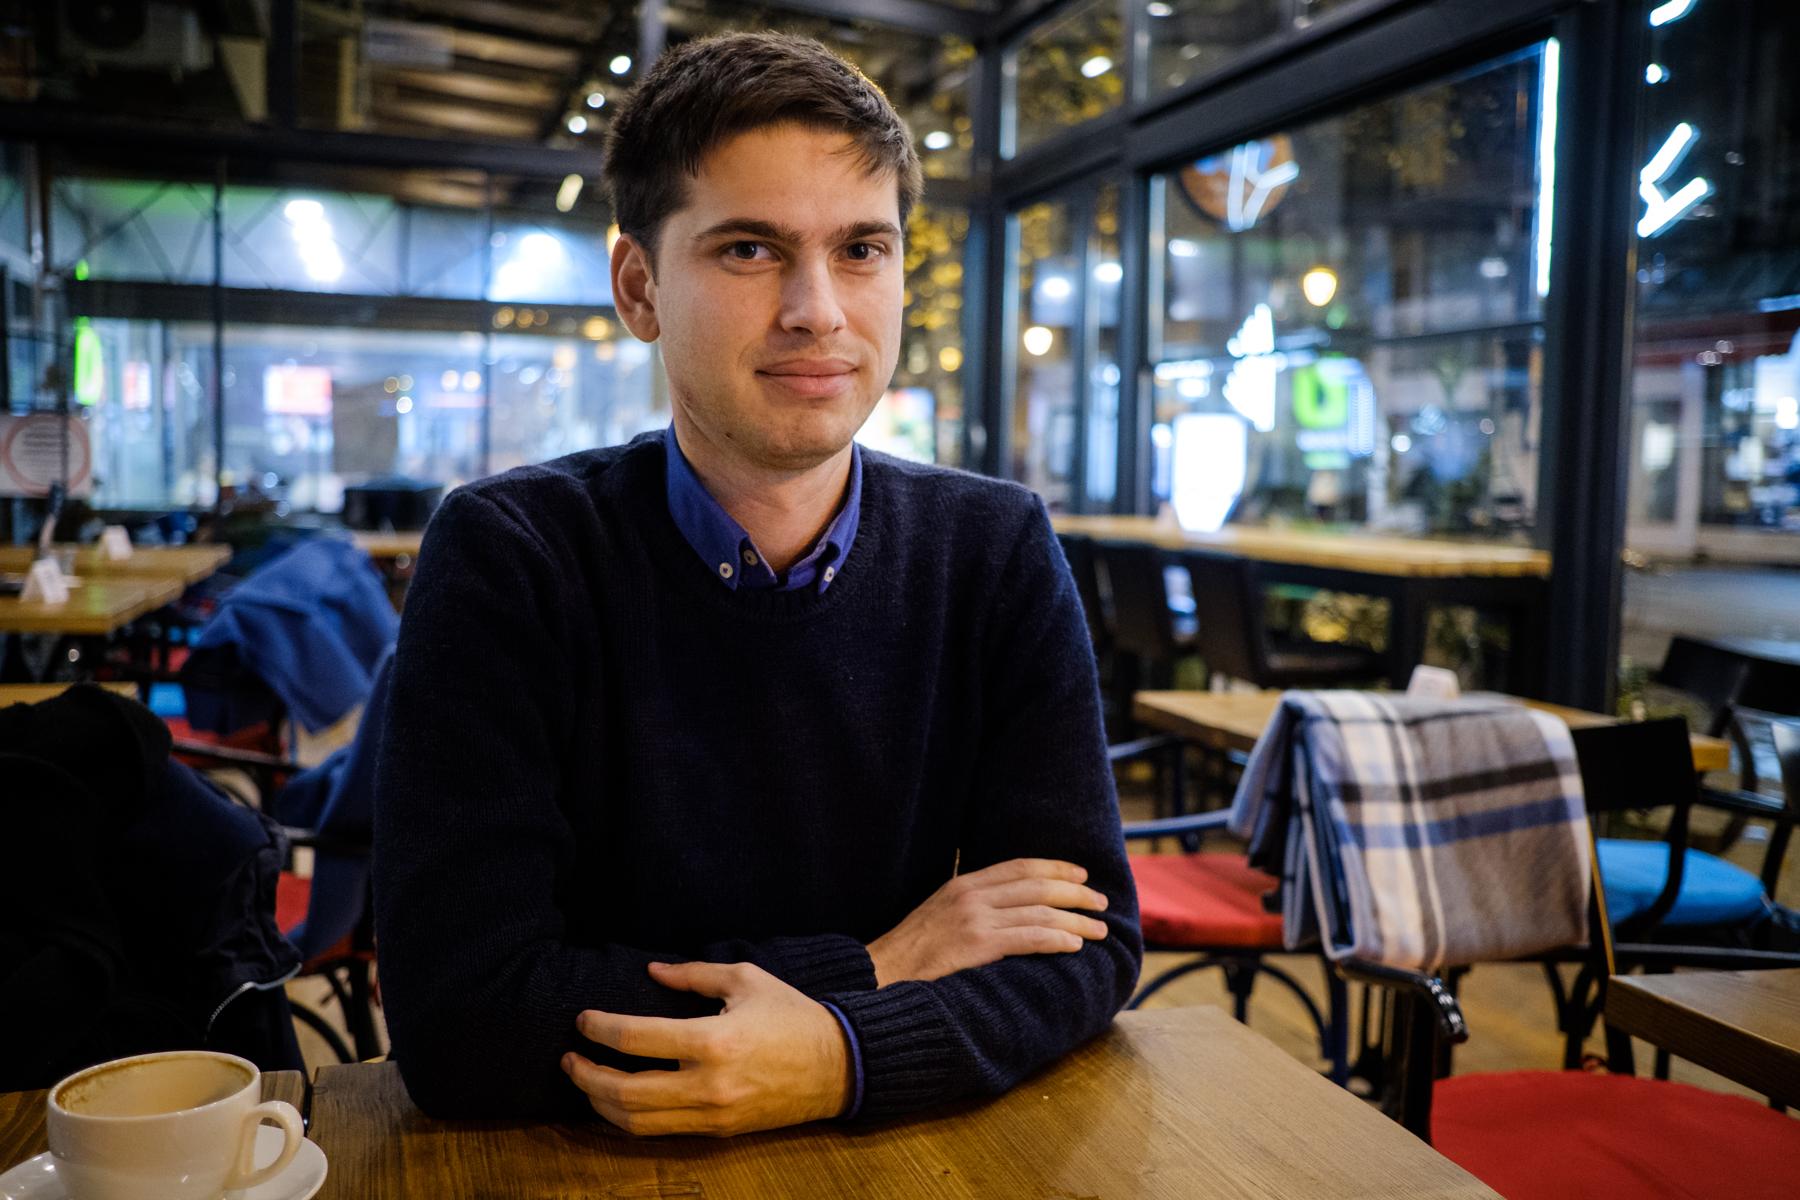 Filip, 29